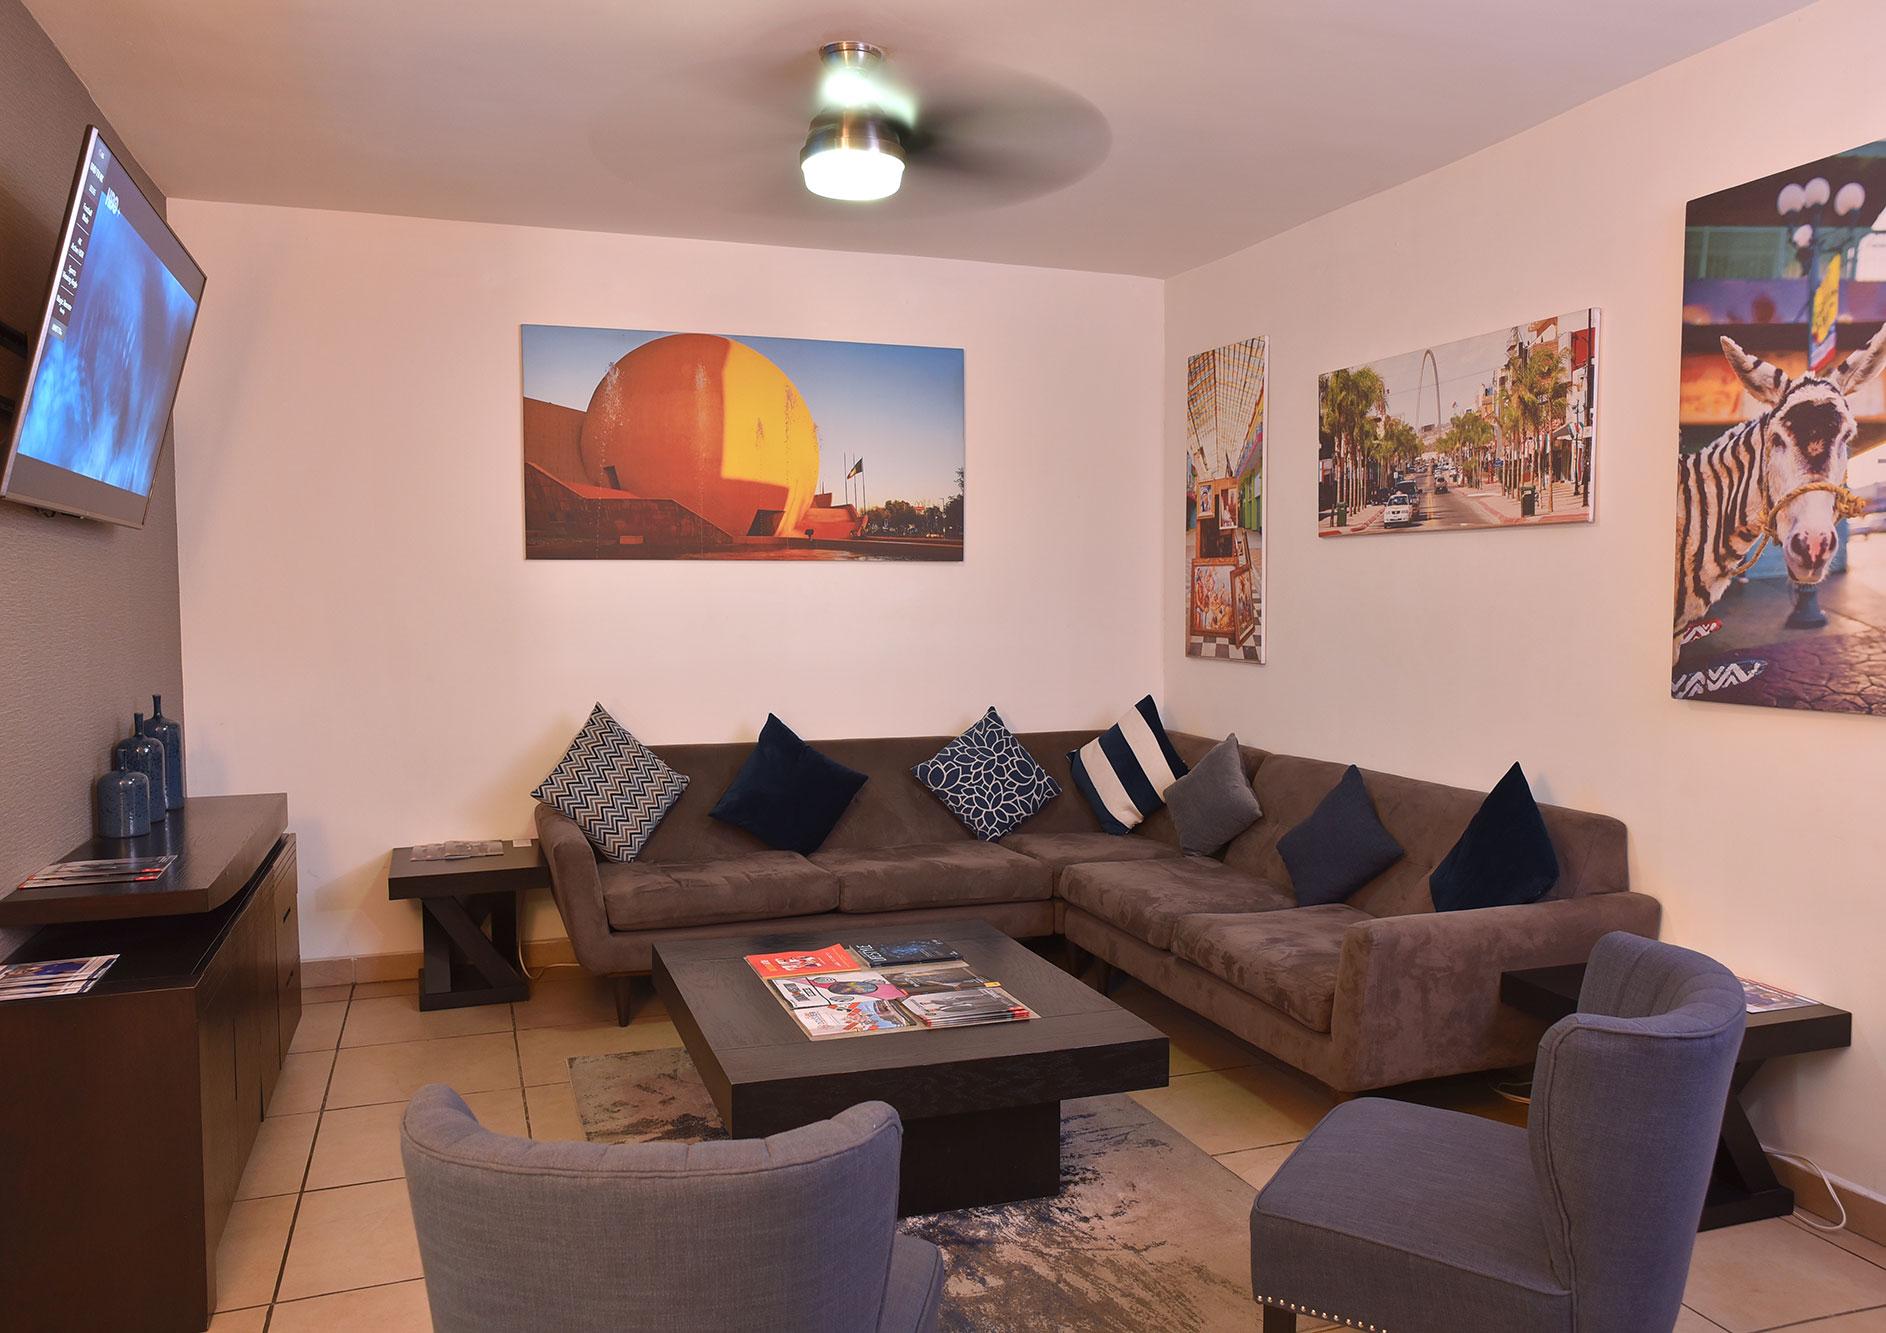 habitacio hotel la mesa tijuana